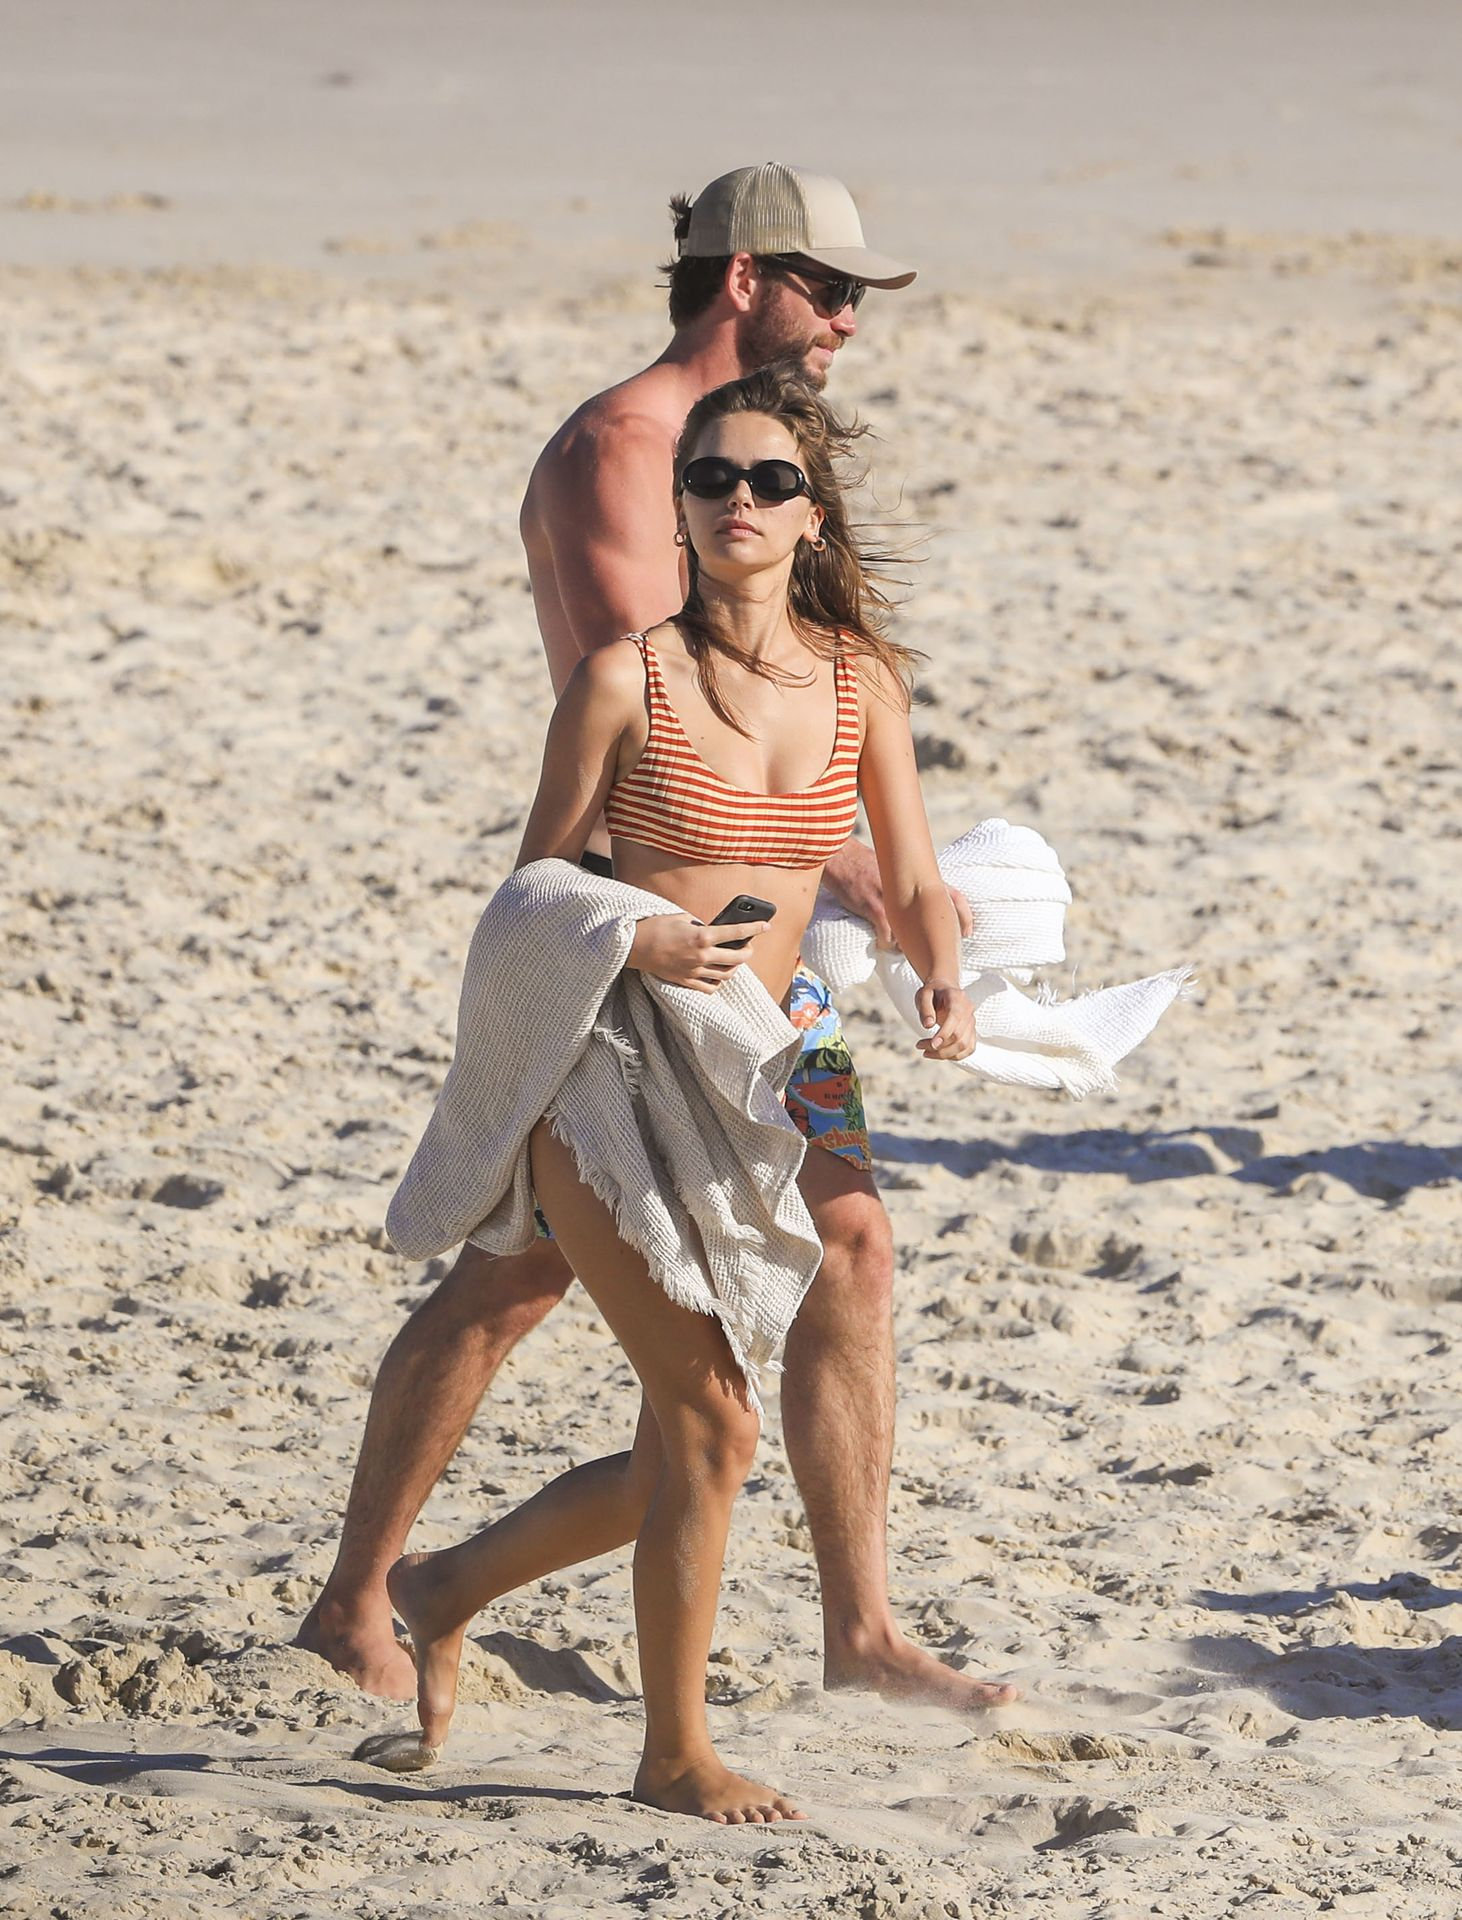 Gabriella Brooks Hot – Liam Hemsworth's New Girlfriend 0062